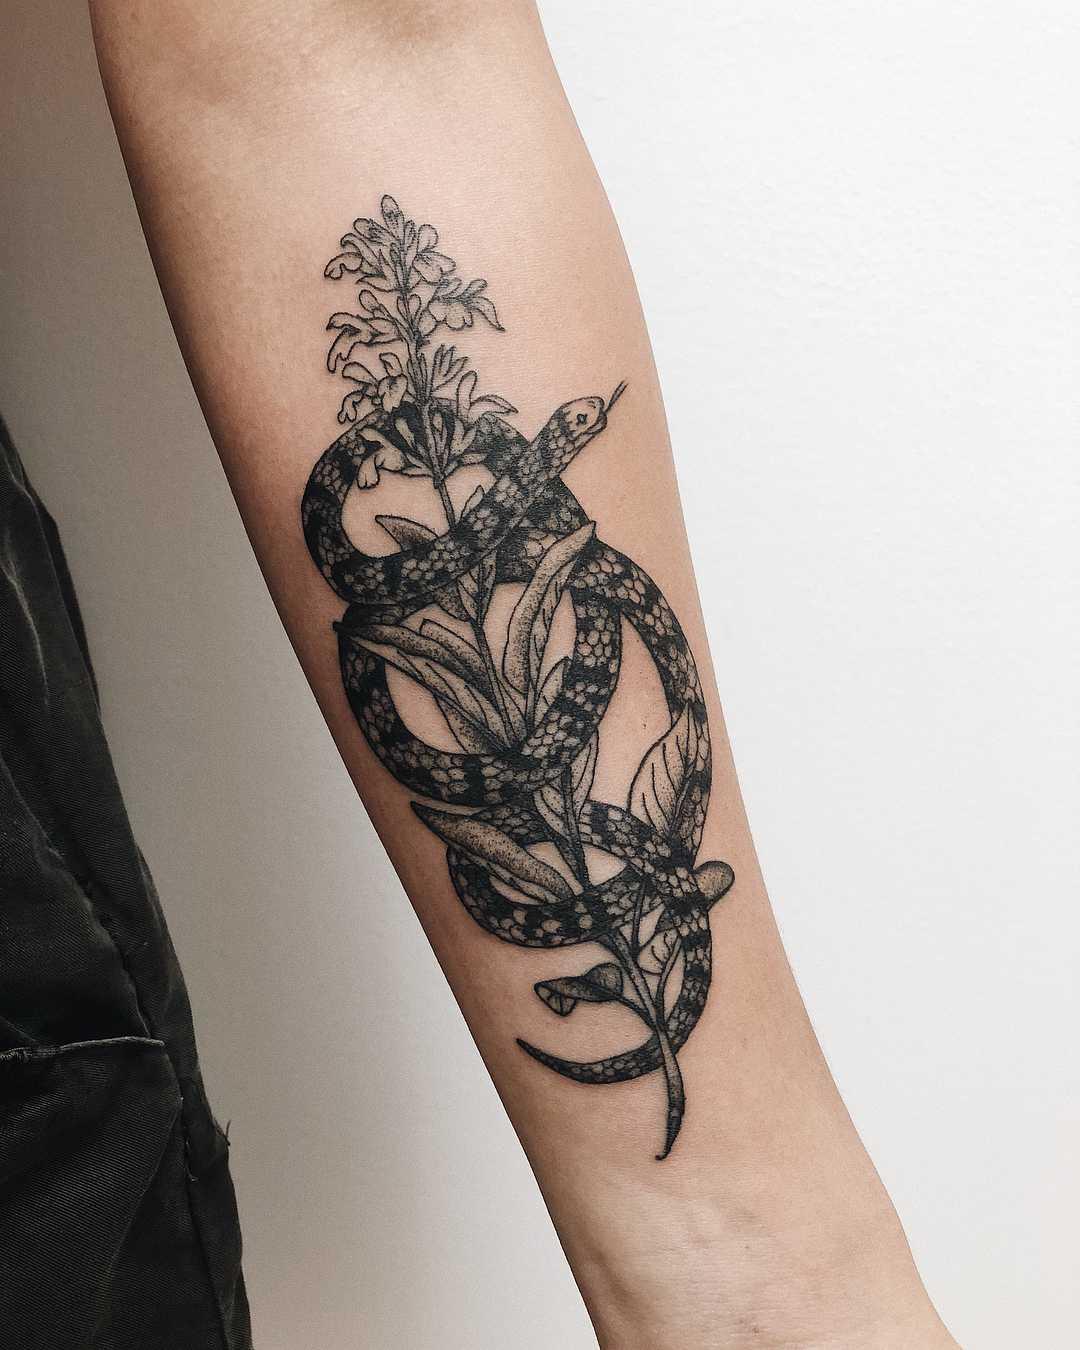 Snake Flower Tattoo: Snake Wrapped Around A Flower